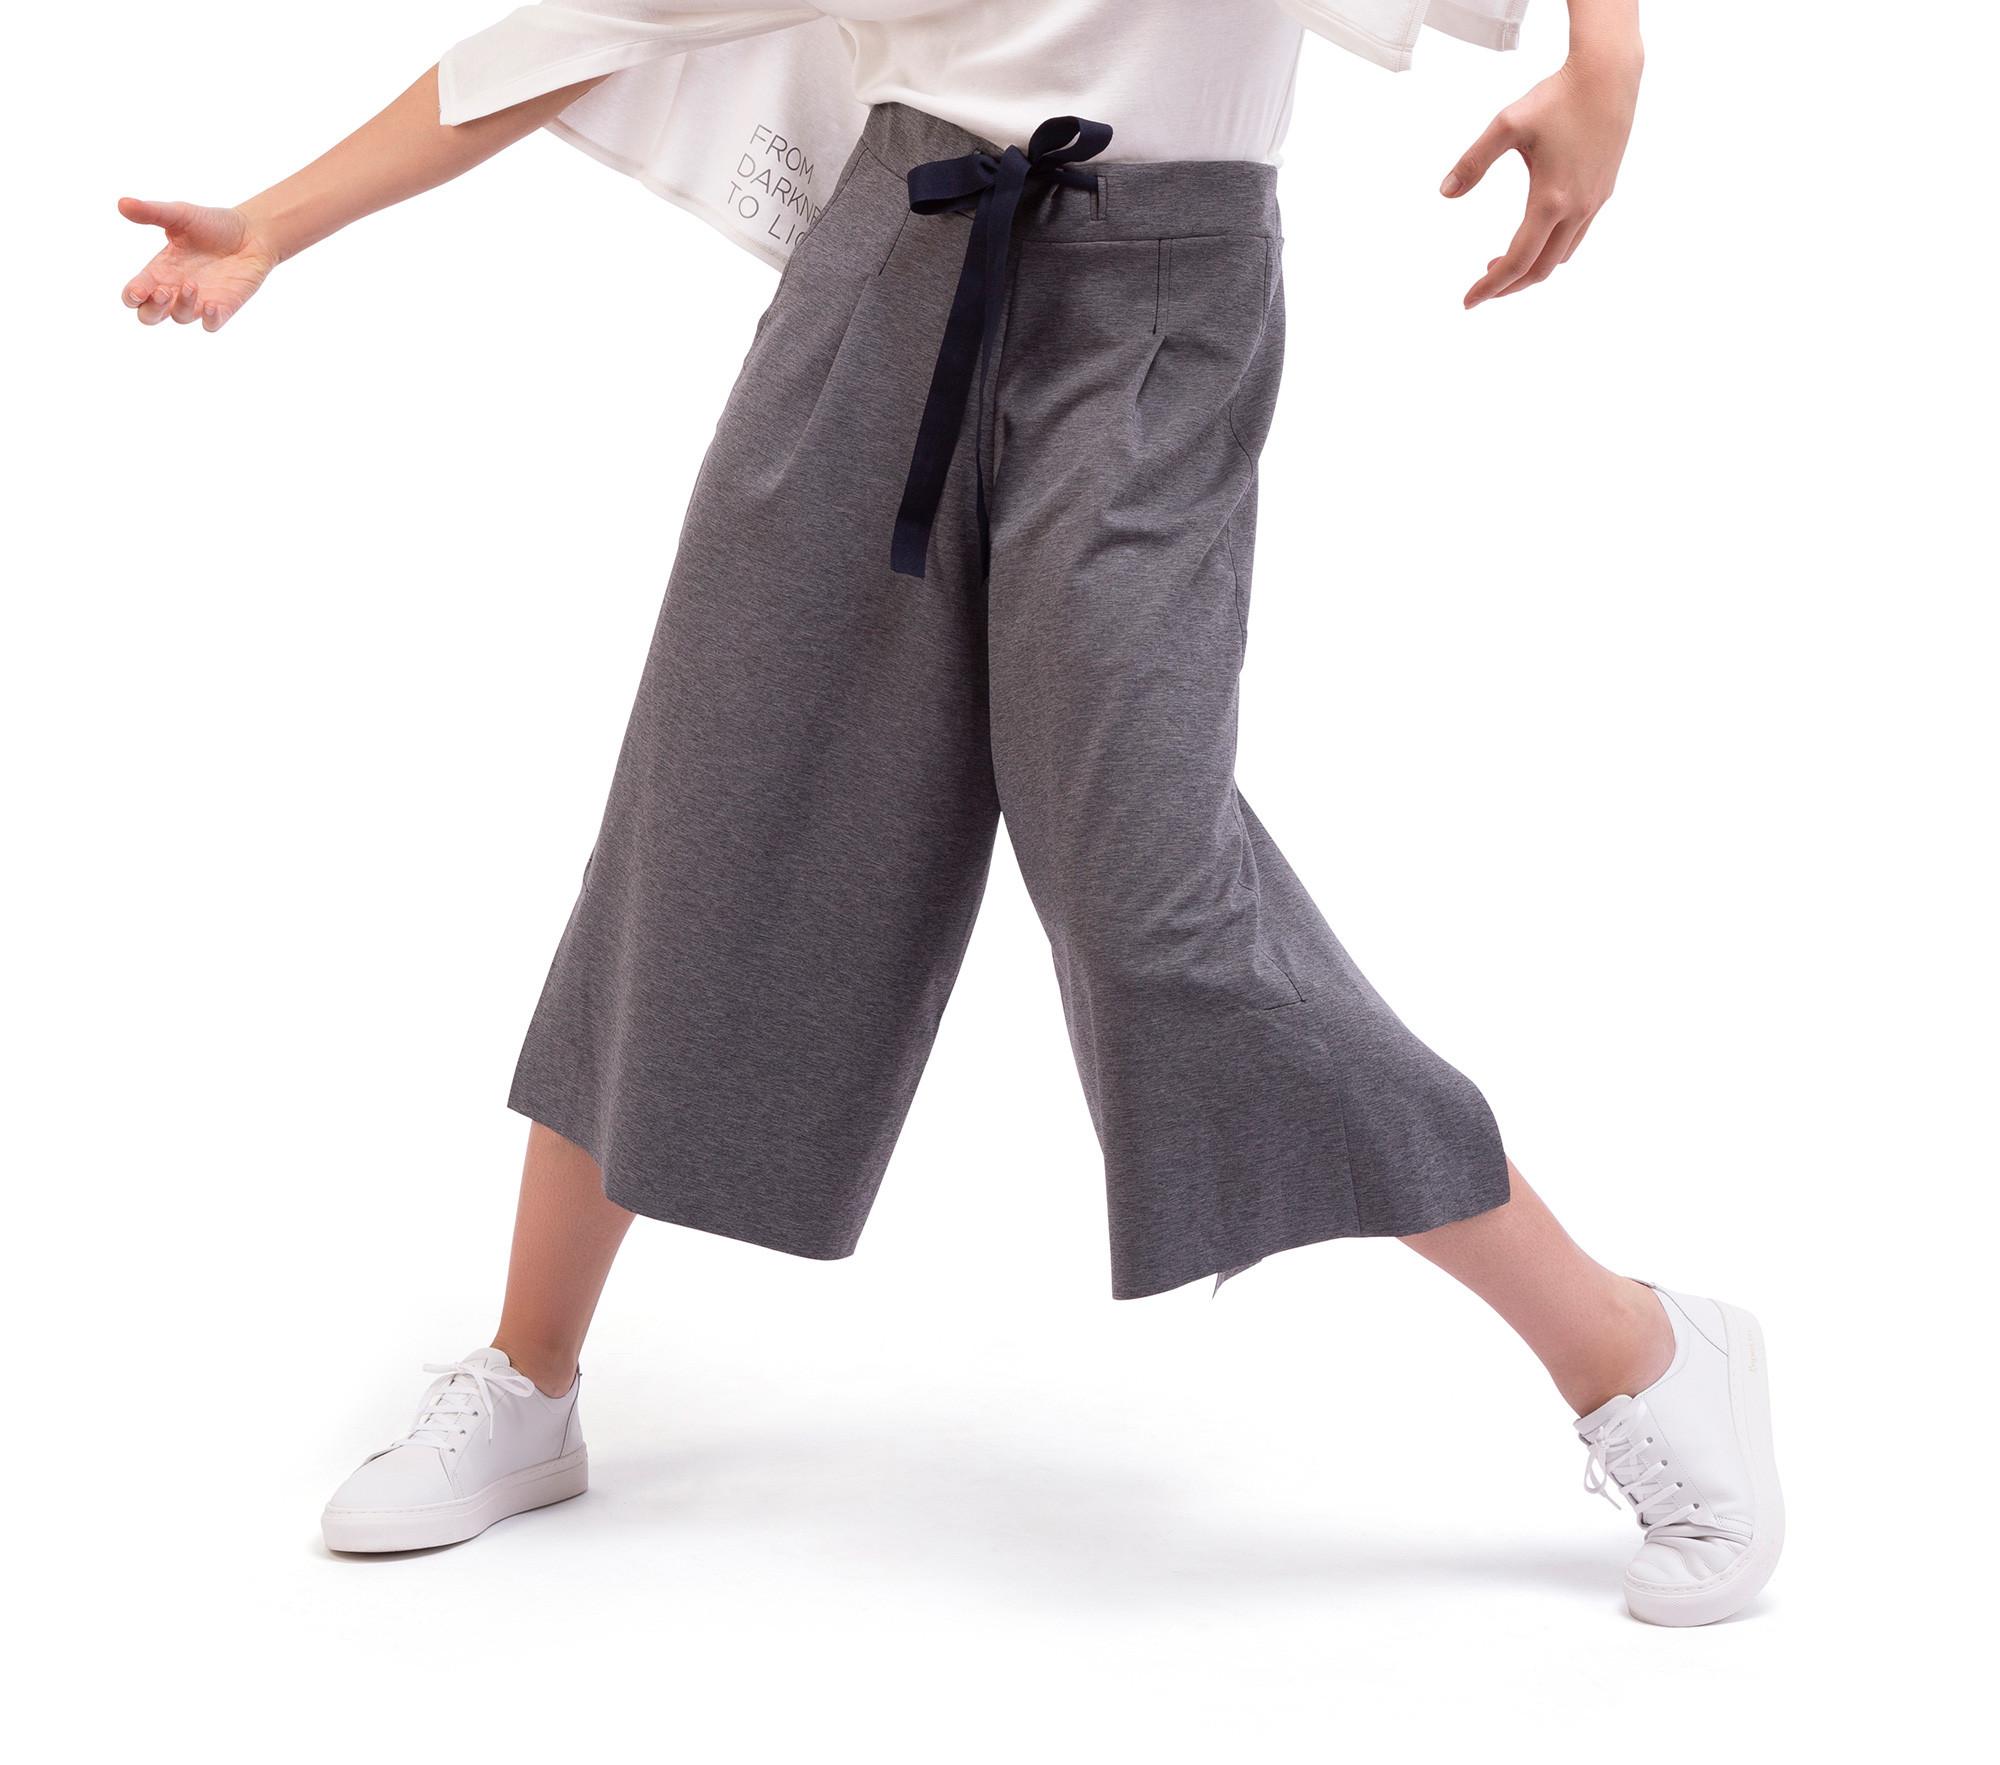 Hosenrock aus Stretch-Strick, beidseitig